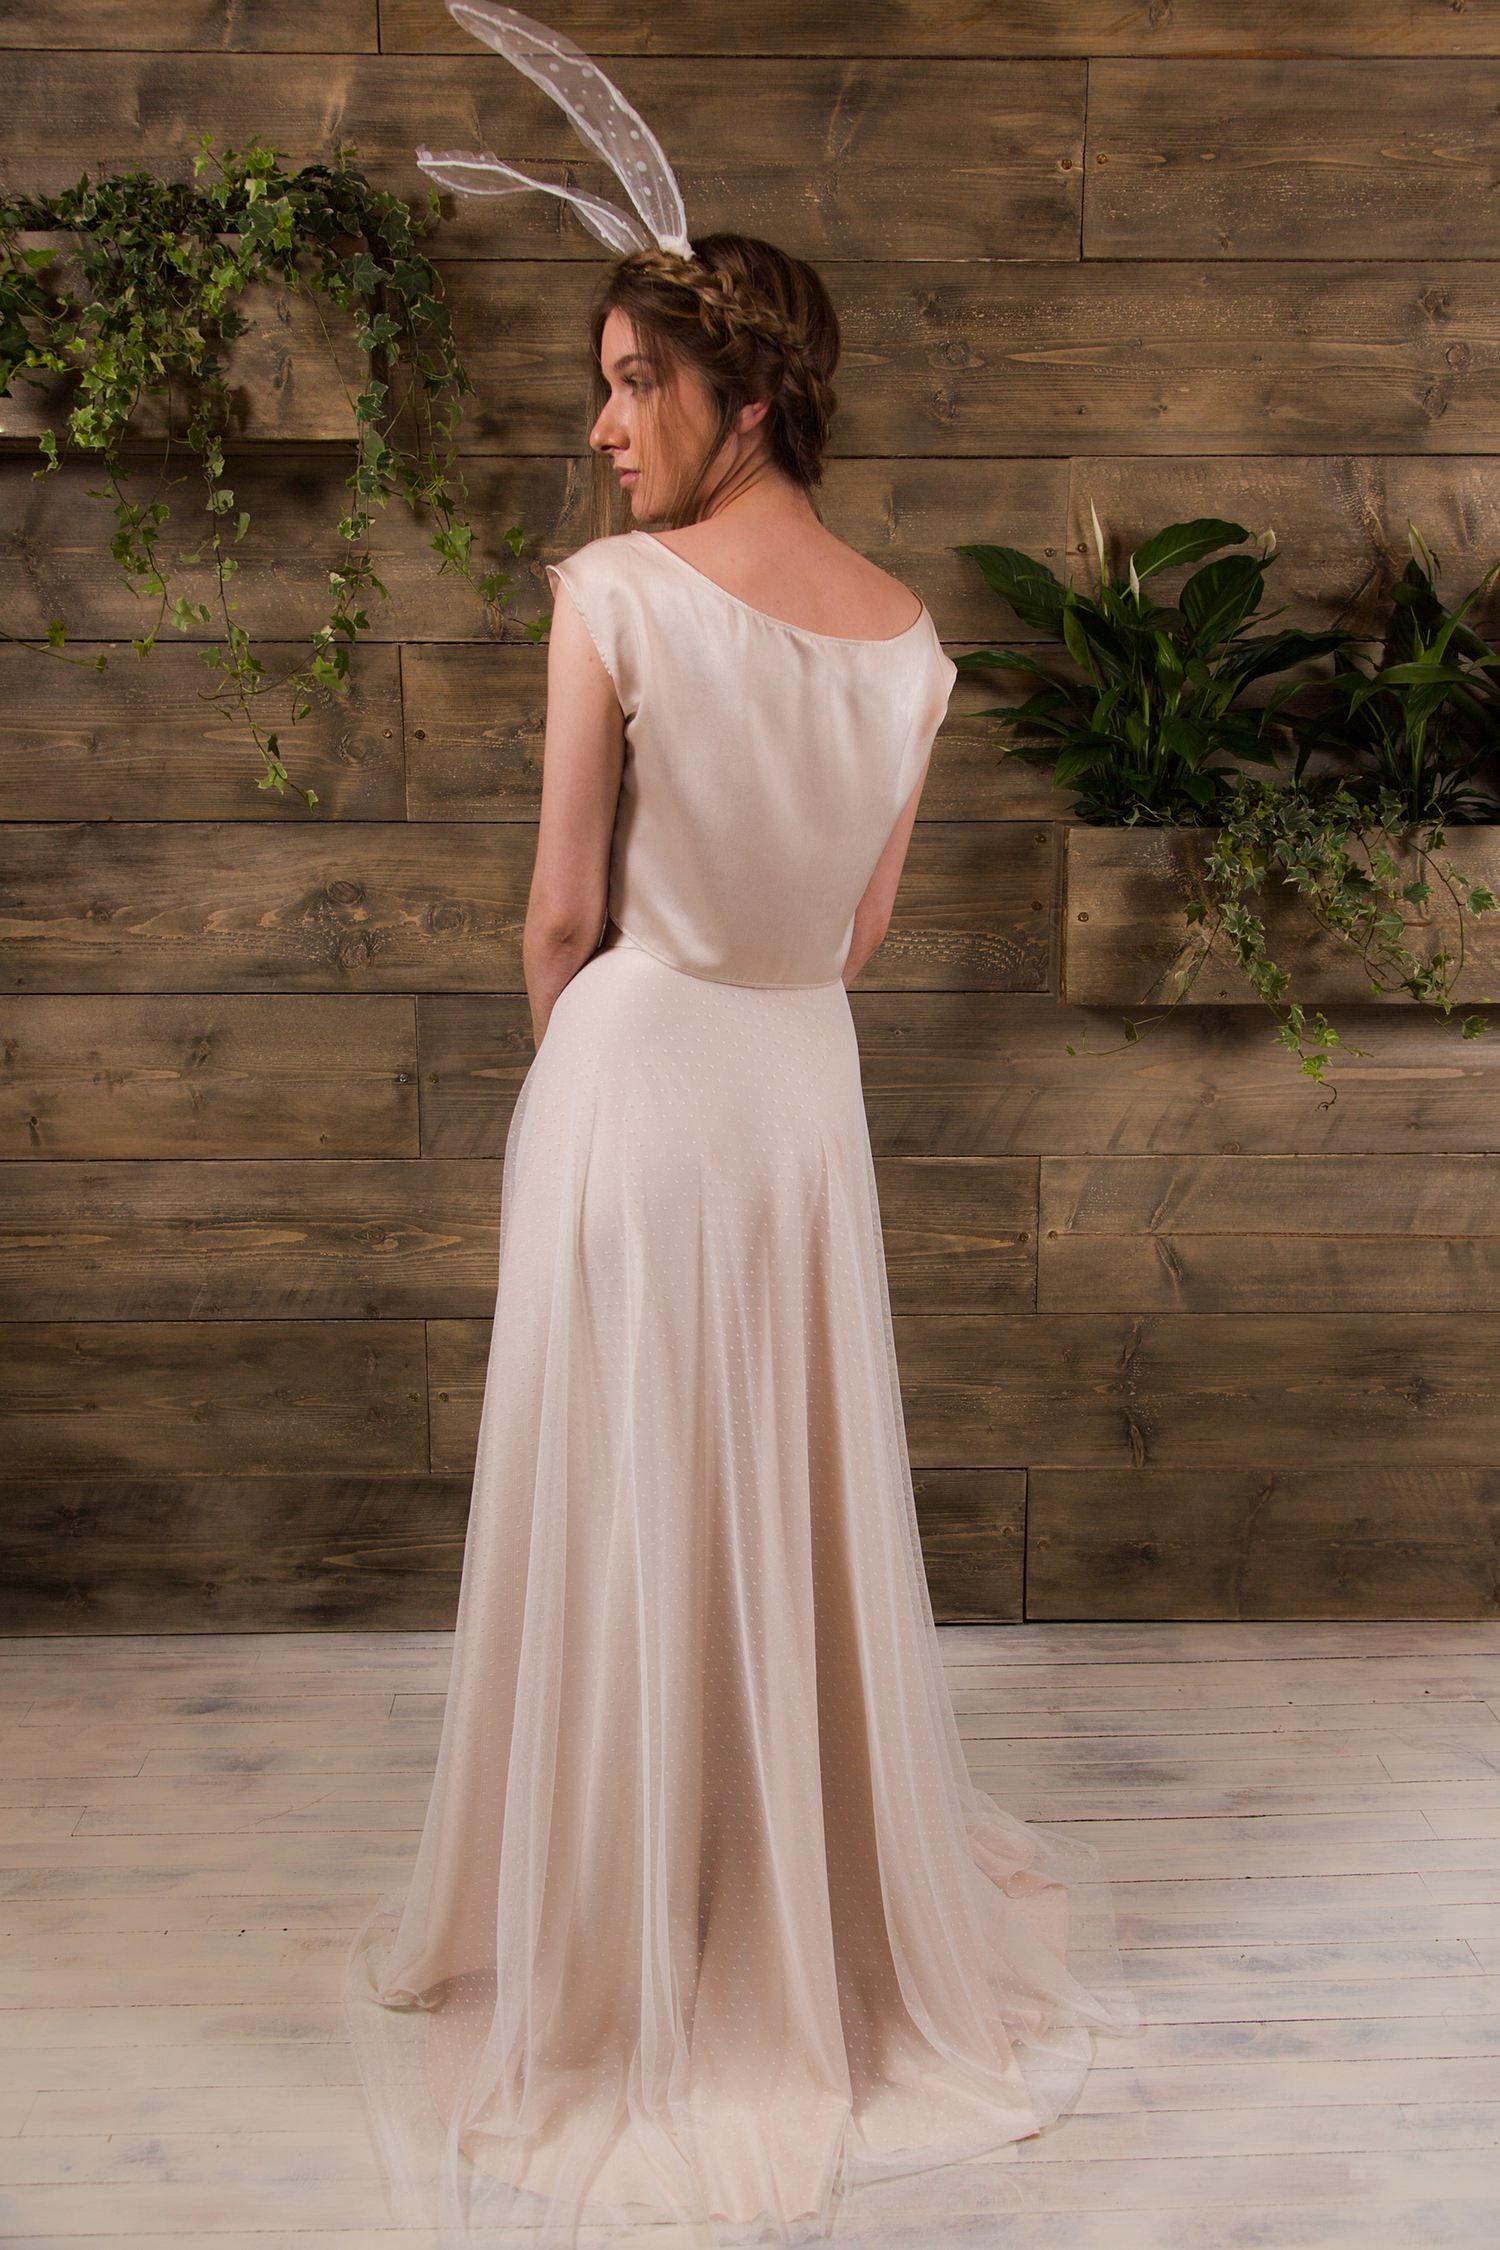 Dress for party wedding  Frankie Bridal seperates  Alternative wedding dresses  Satin